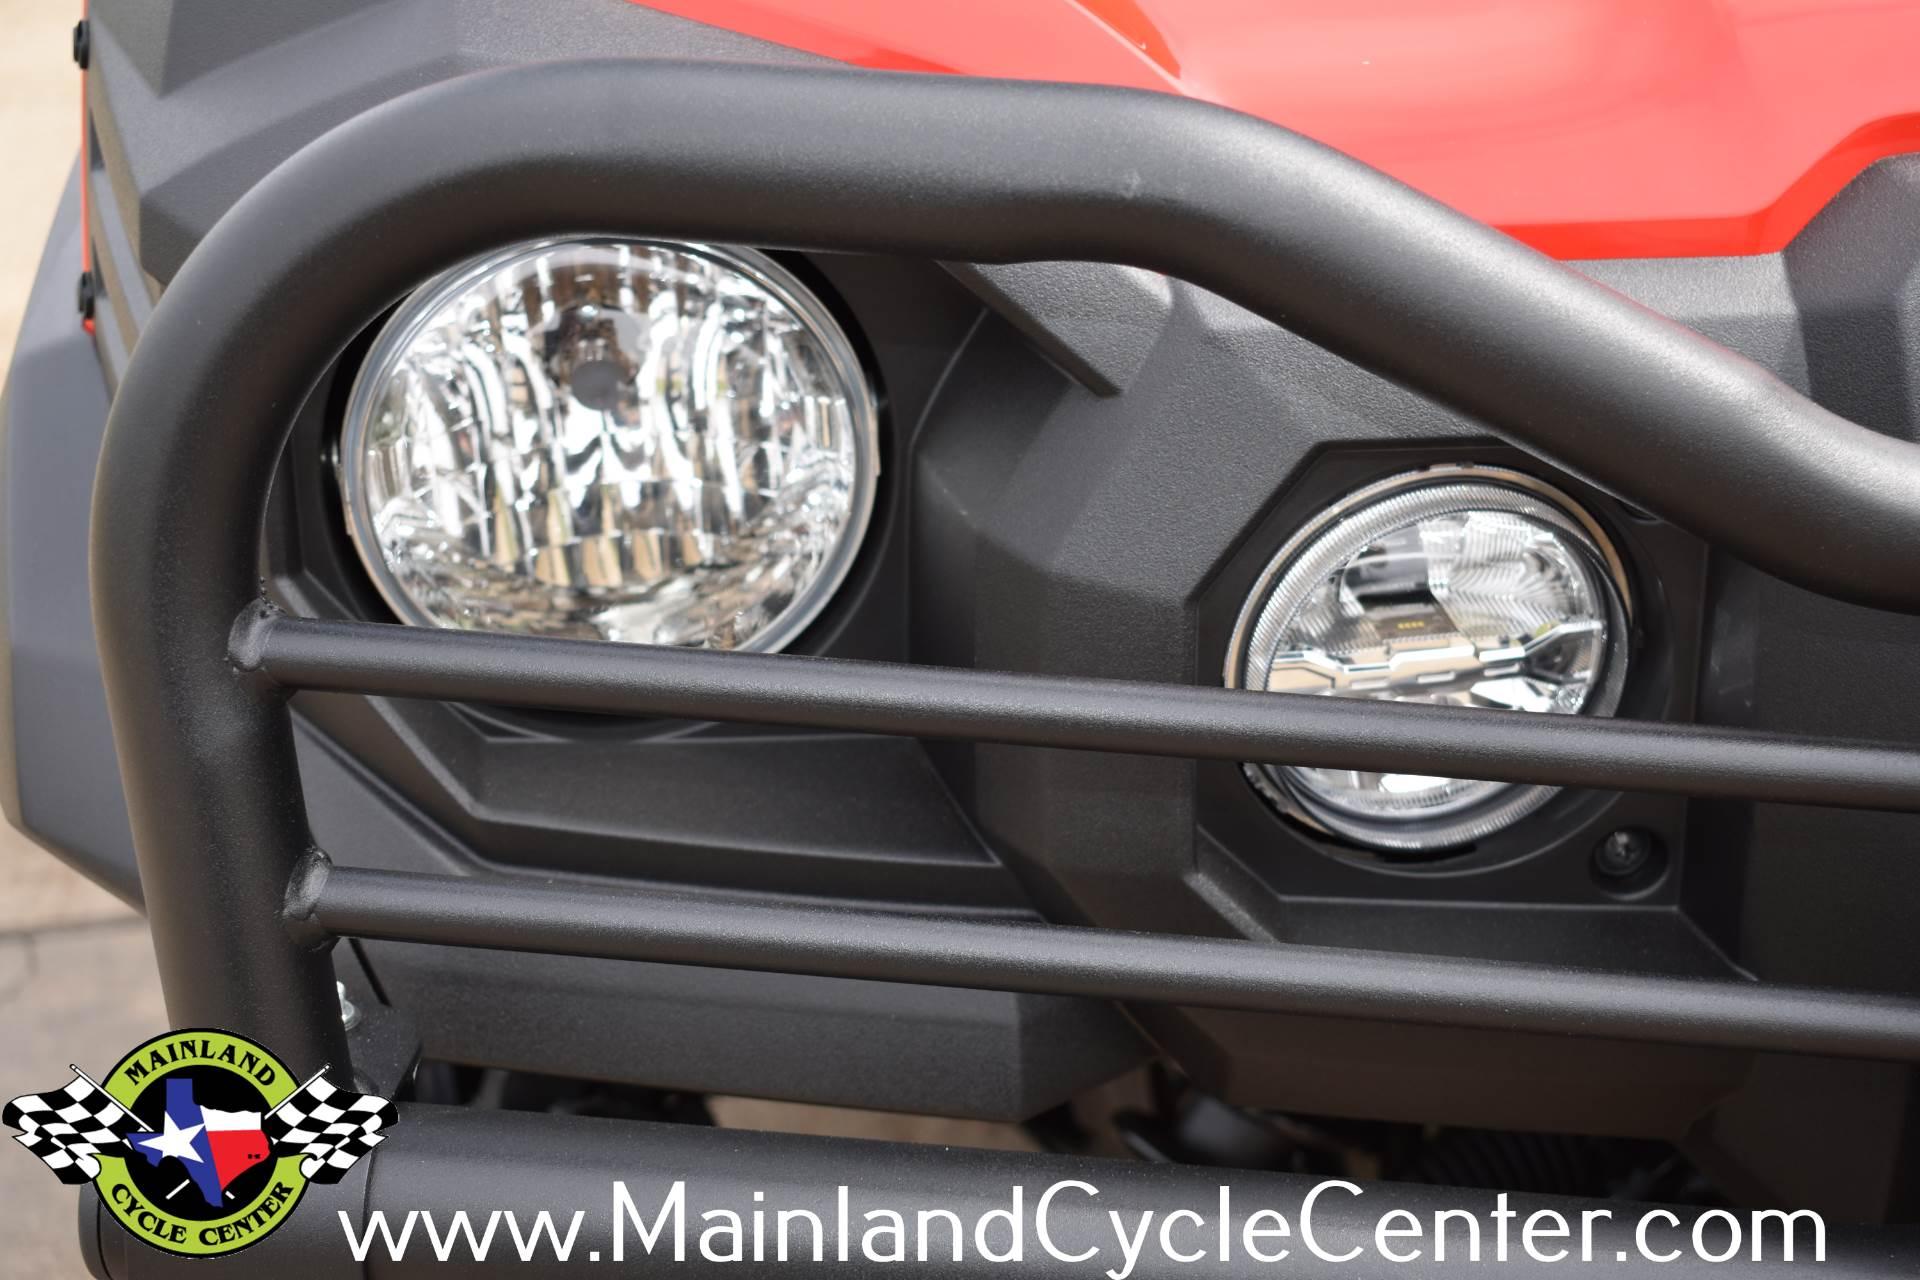 2019 Kawasaki Mule PRO-FXT EPS LE in La Marque, Texas